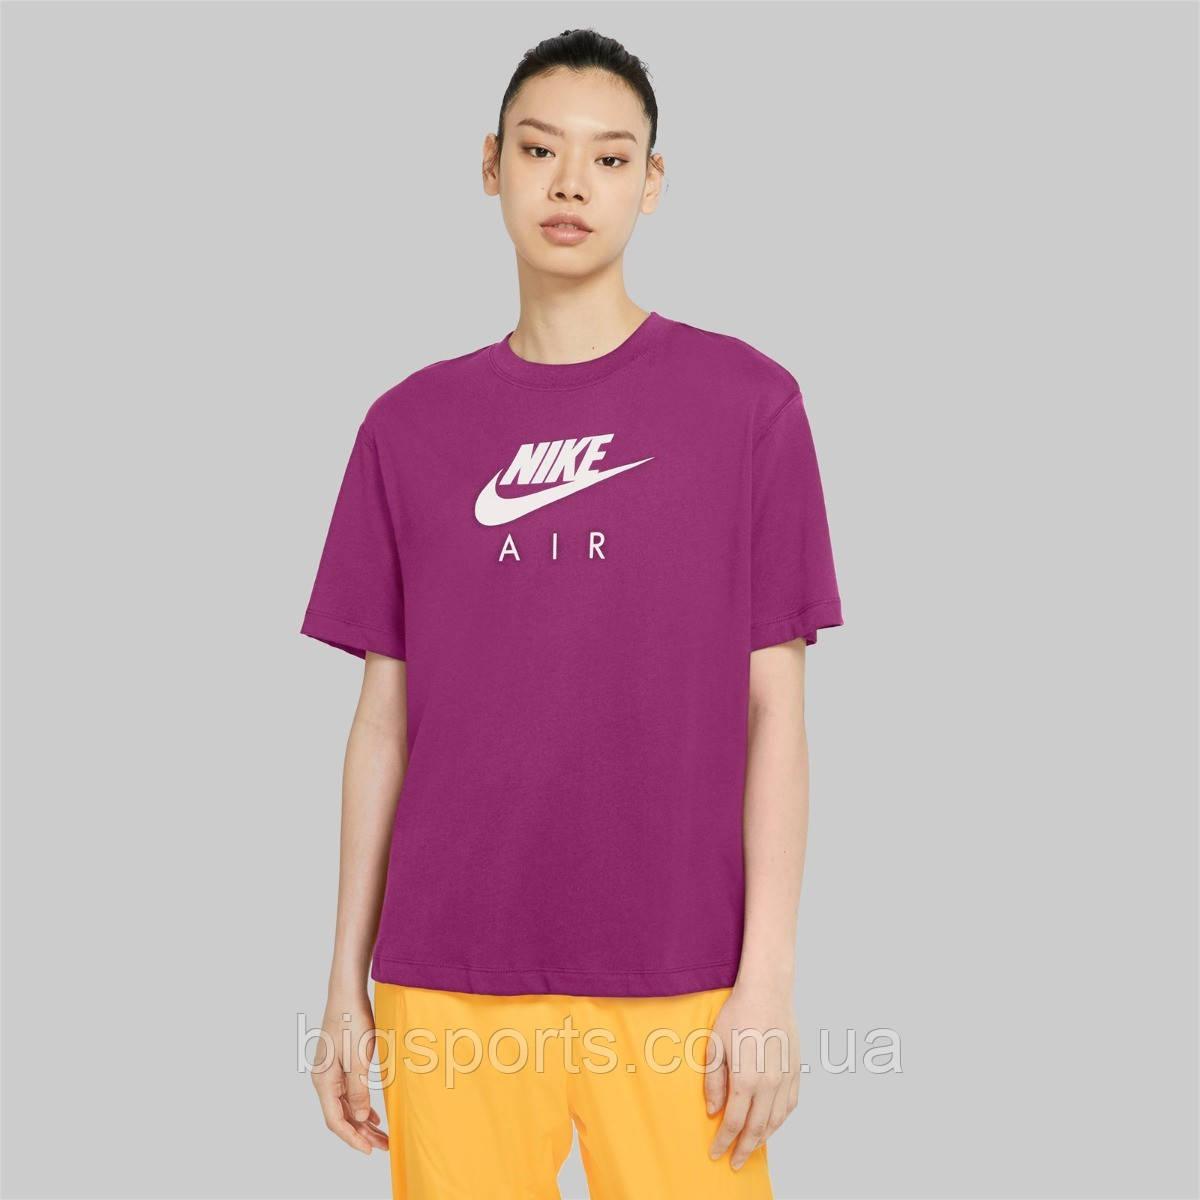 Футболка дружин. Nike Air women's Short Sleeve Top (арт. CU5558-564)